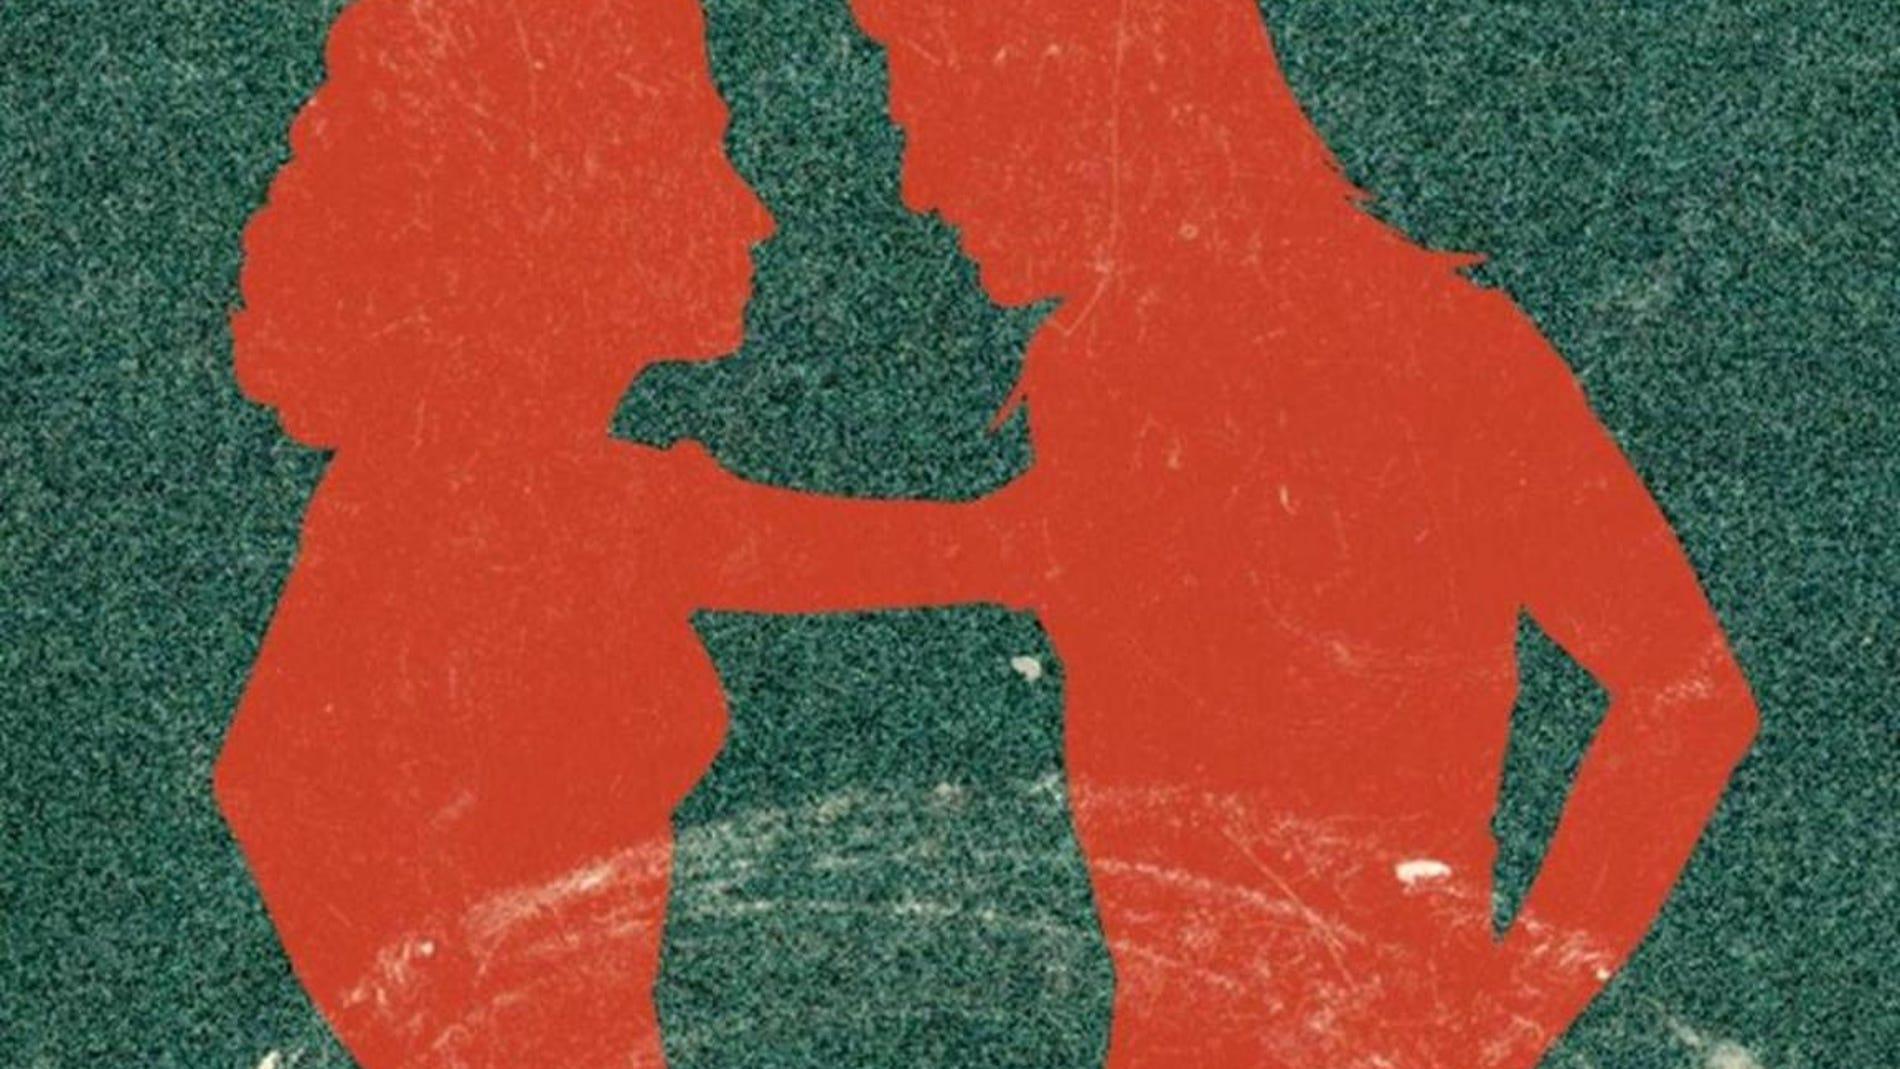 nuevo-disco-de-camela-1.jpg